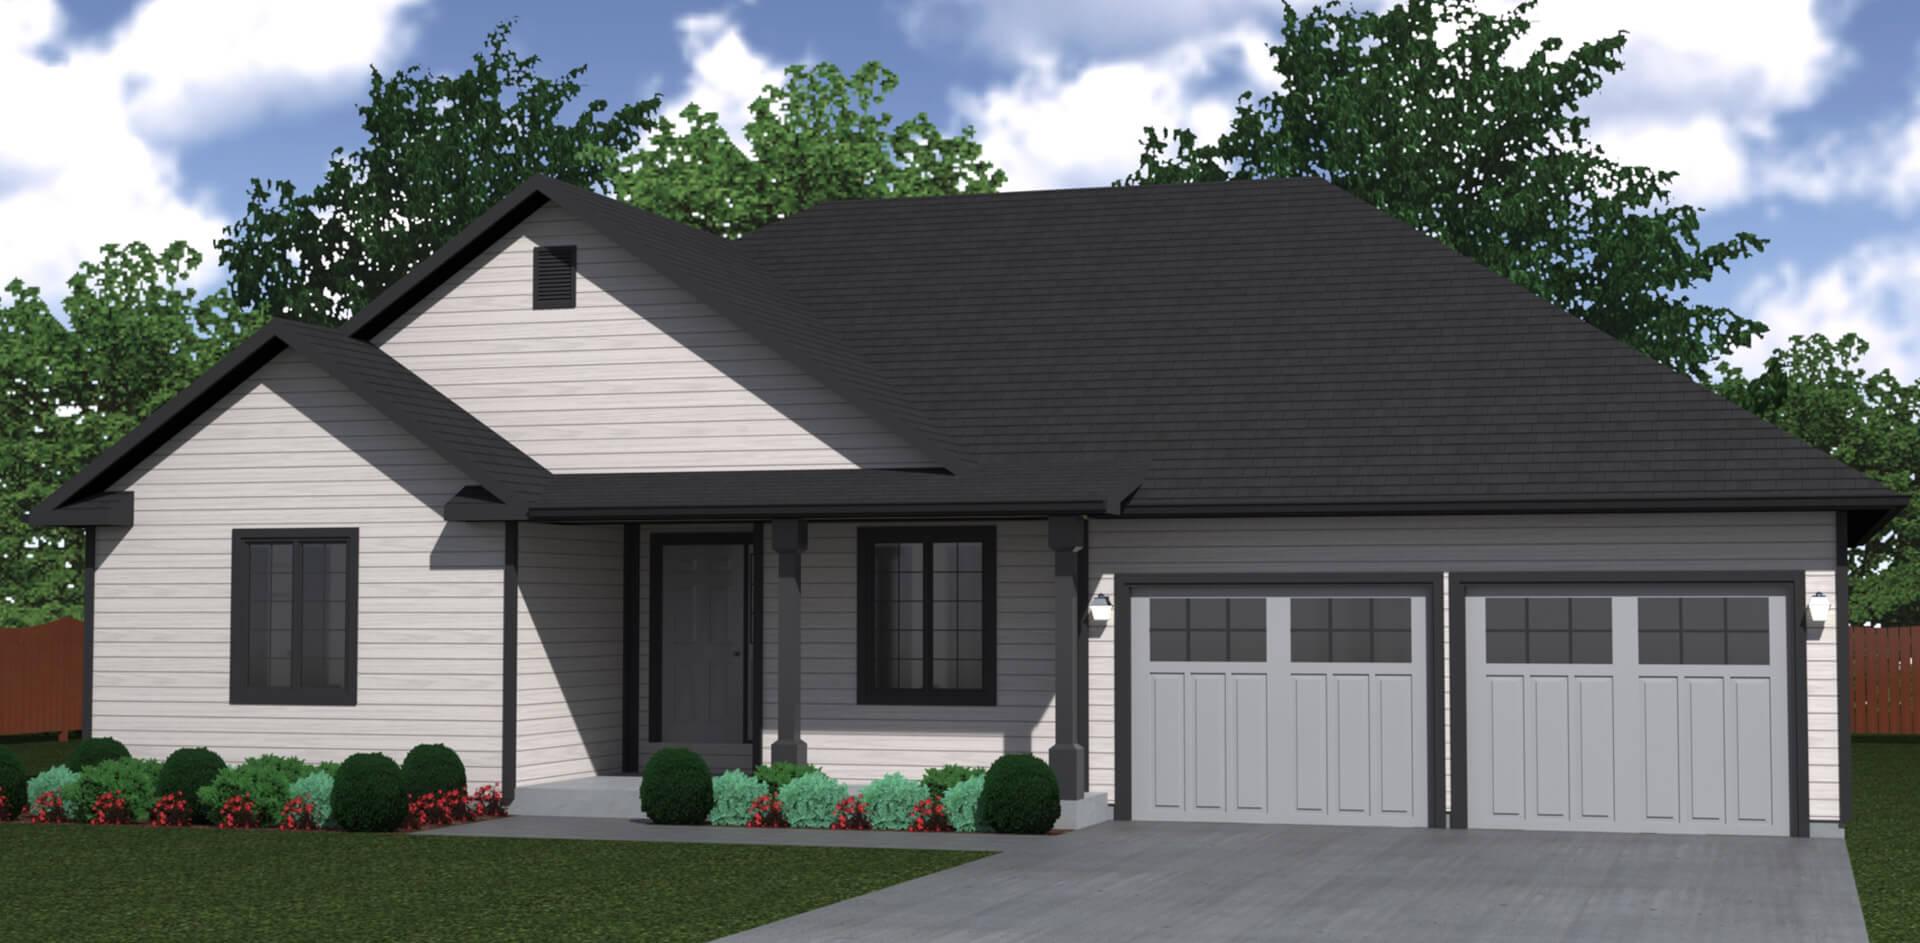 1709 house exterior